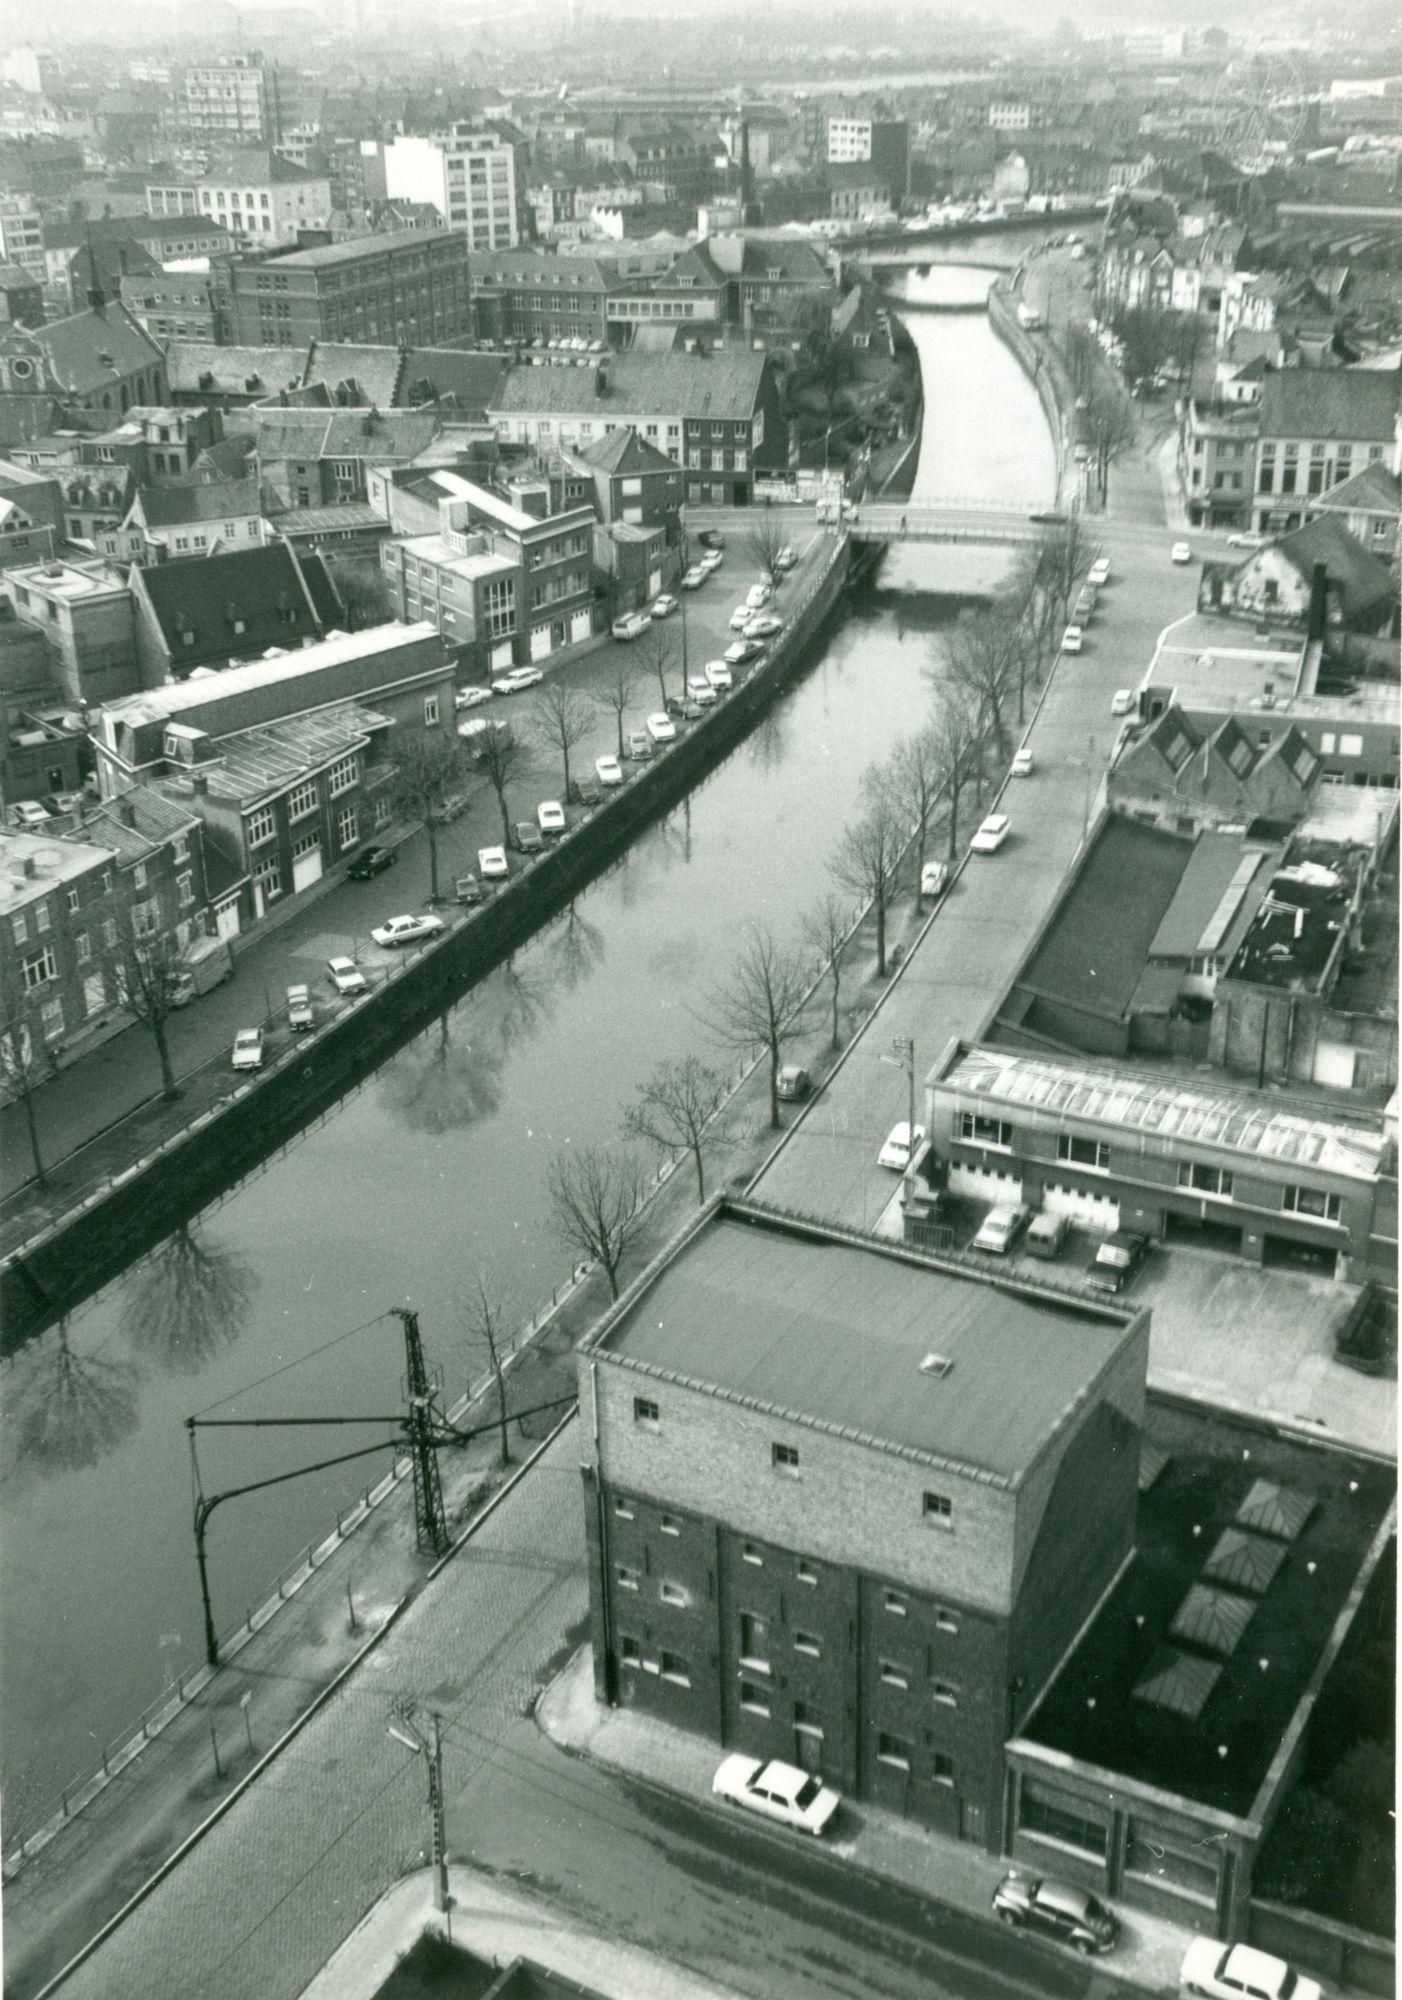 Diksmuidekaai 1975